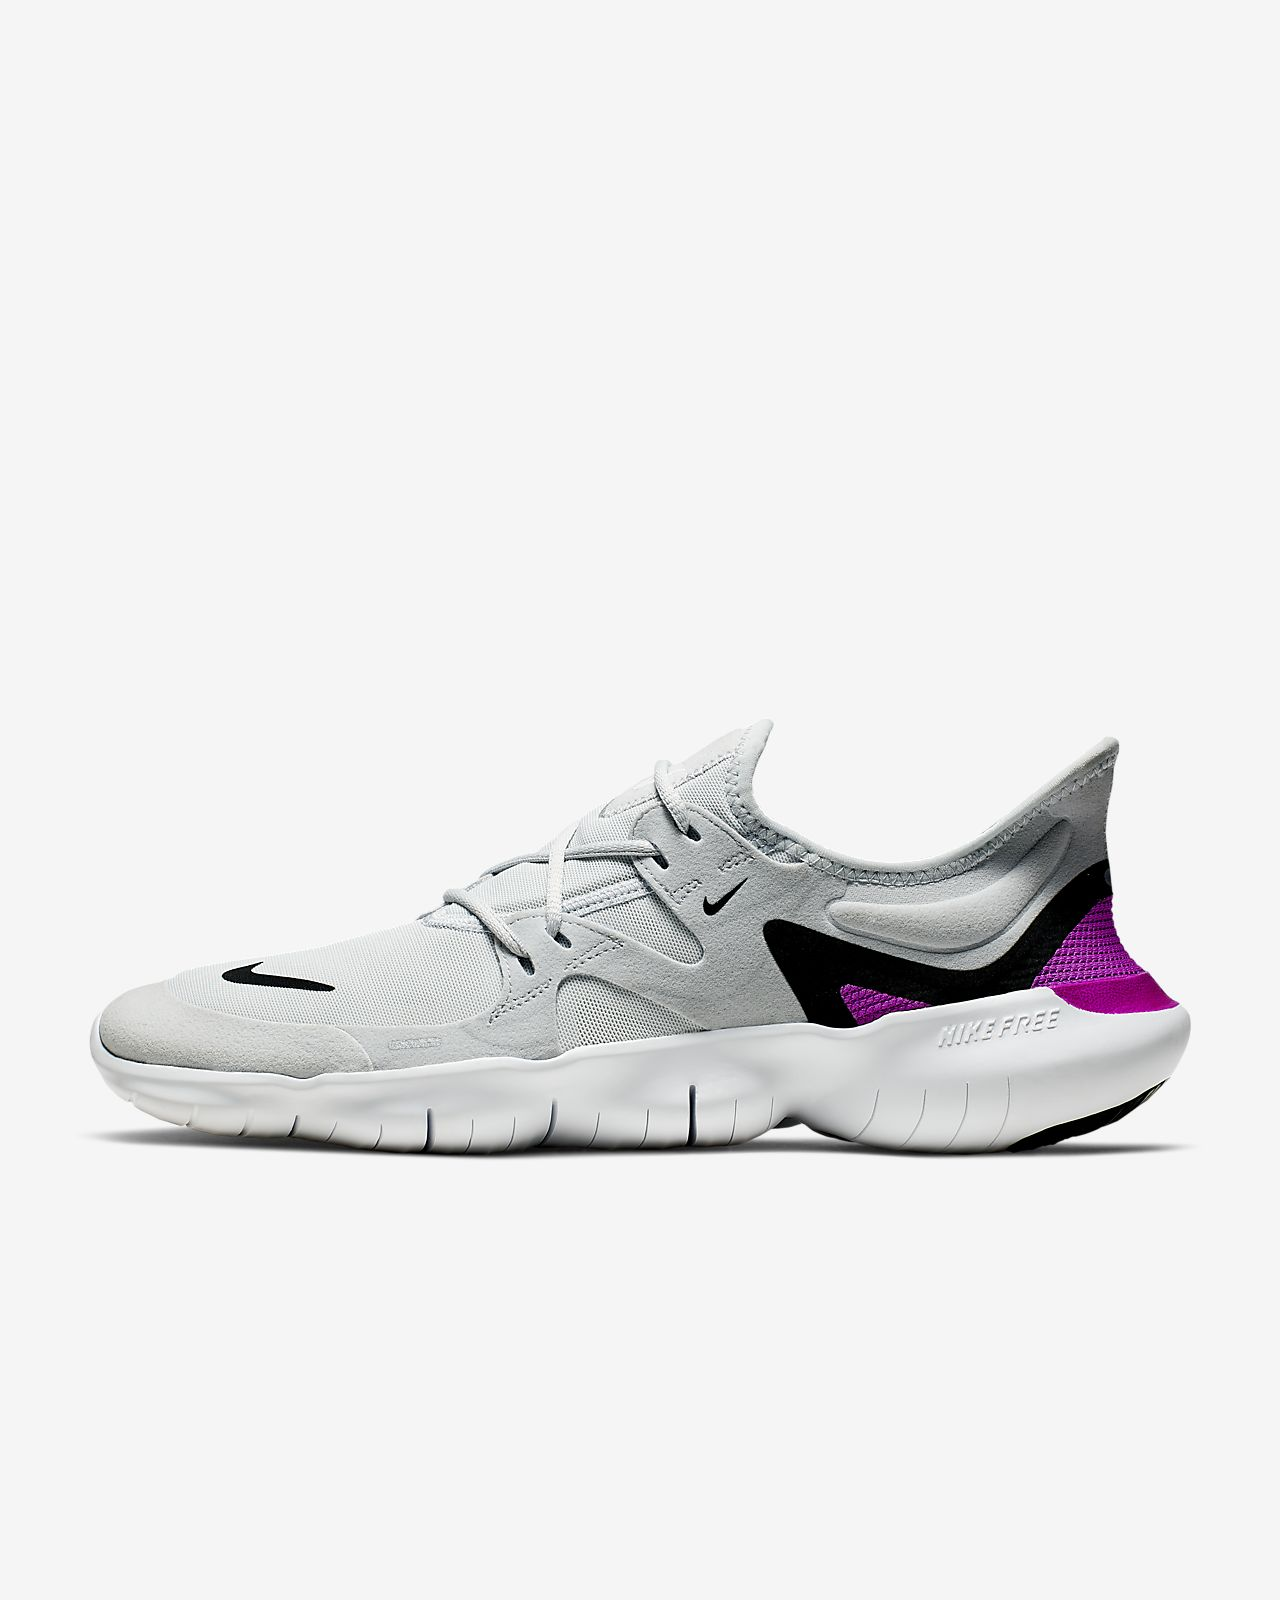 la meilleure attitude 4add3 9846d Chaussure de running Nike Free RN 5.0 pour Homme